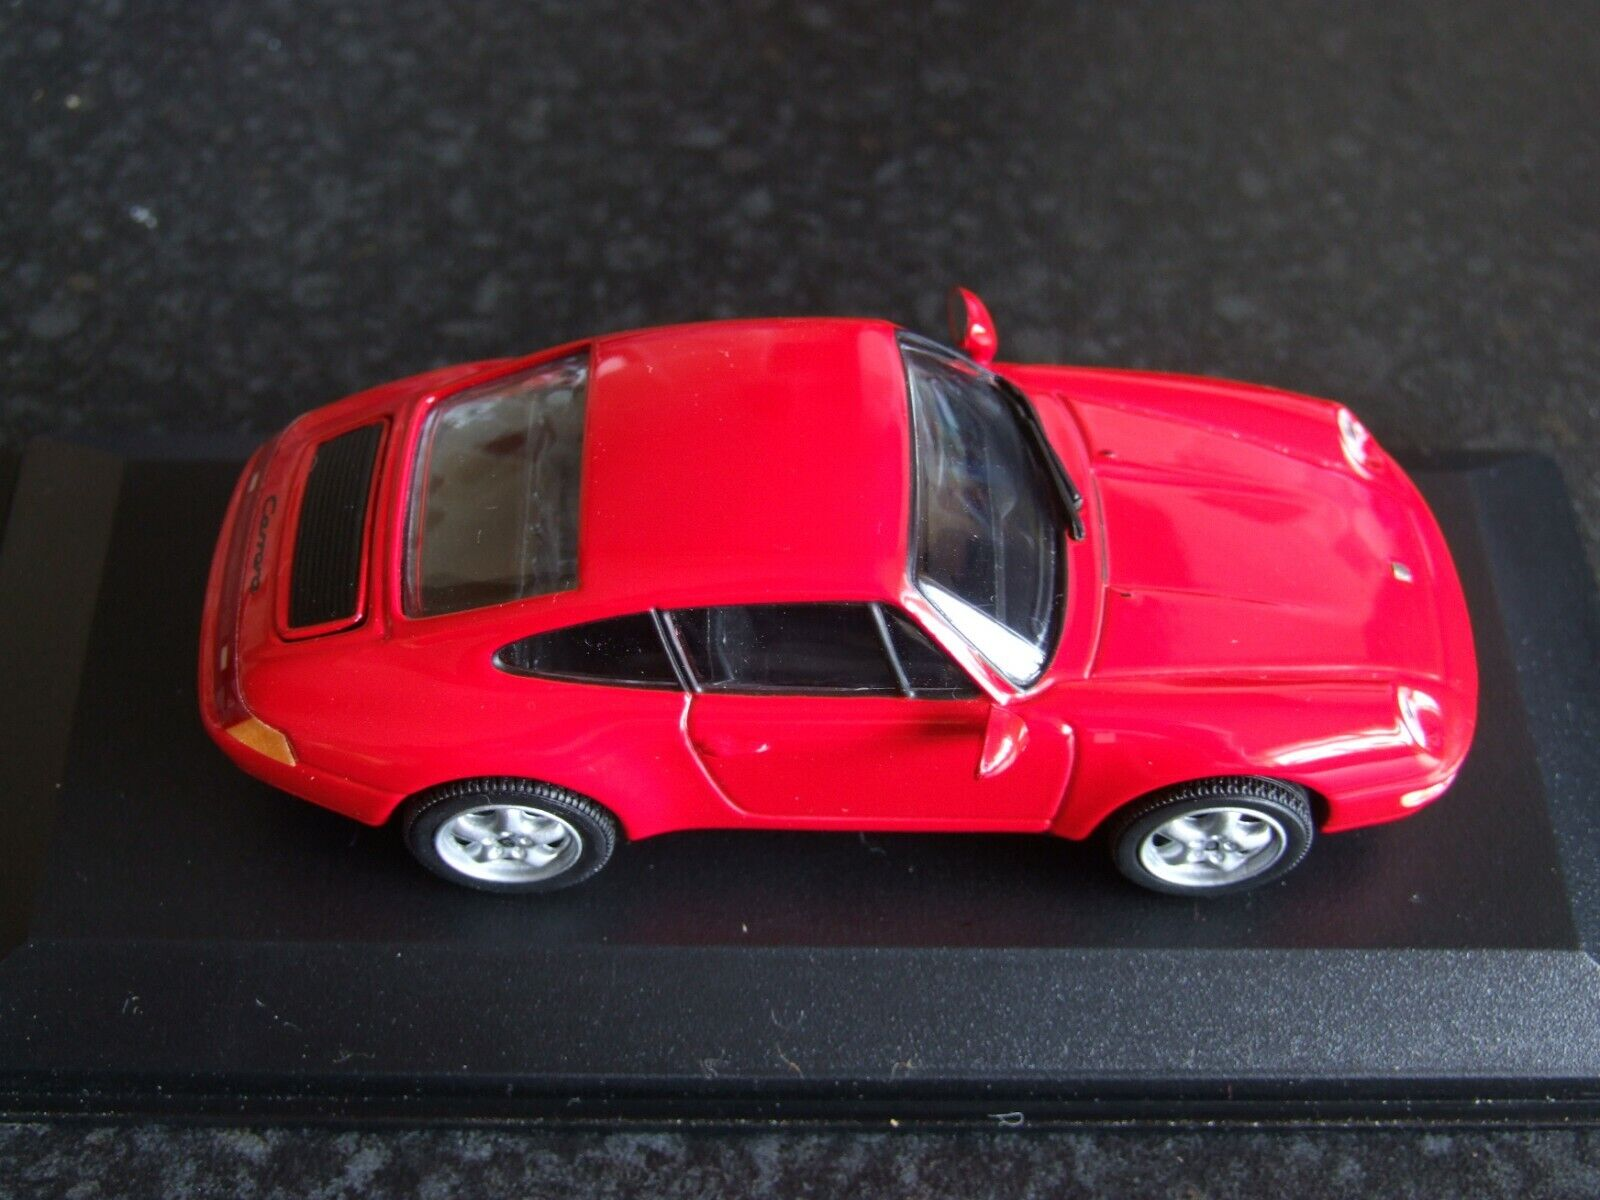 Minichamps 430063007 1 43 Porsche 911 993 Carrera - Red